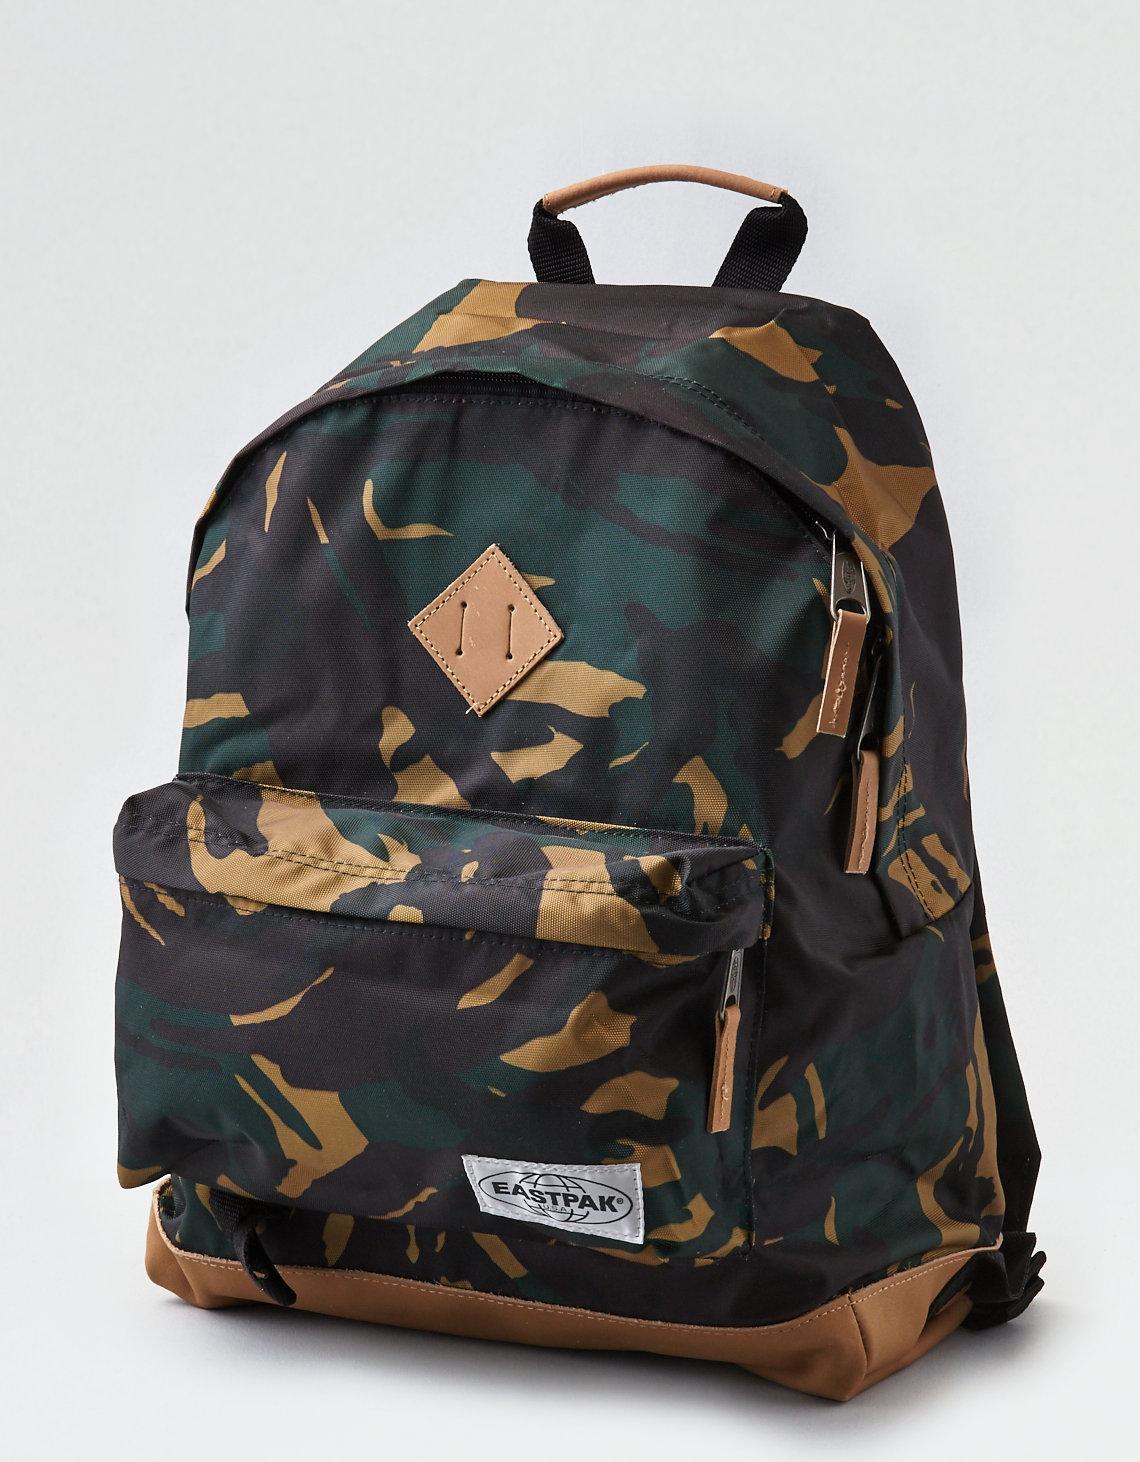 Where To Buy Eastpak Backpacks- Fenix Toulouse Handball